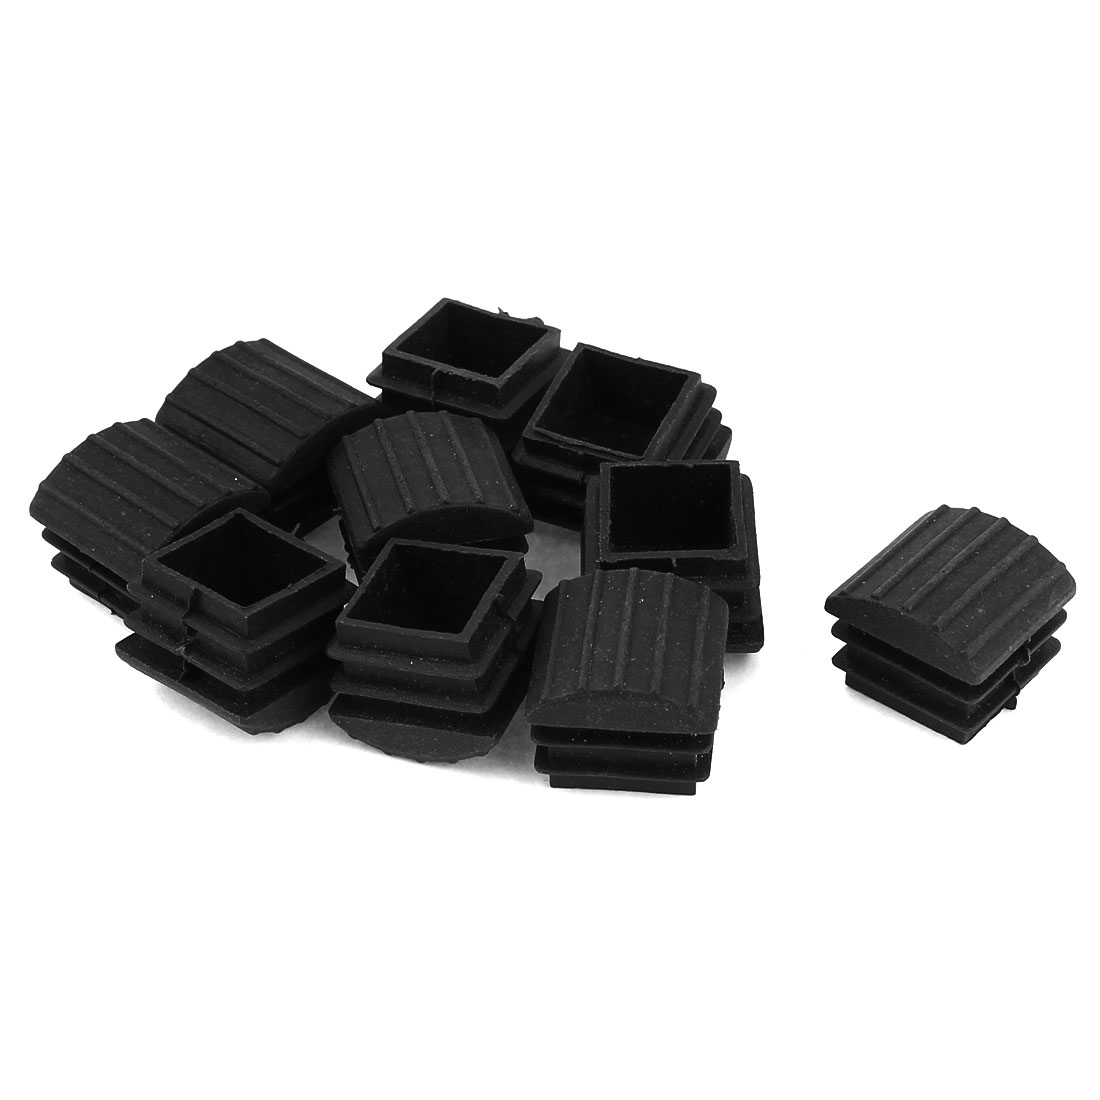 20mm x 20mm Plastic Threaded Square Anti-Slip Tubing Tube Insert Caps 10 Pcs